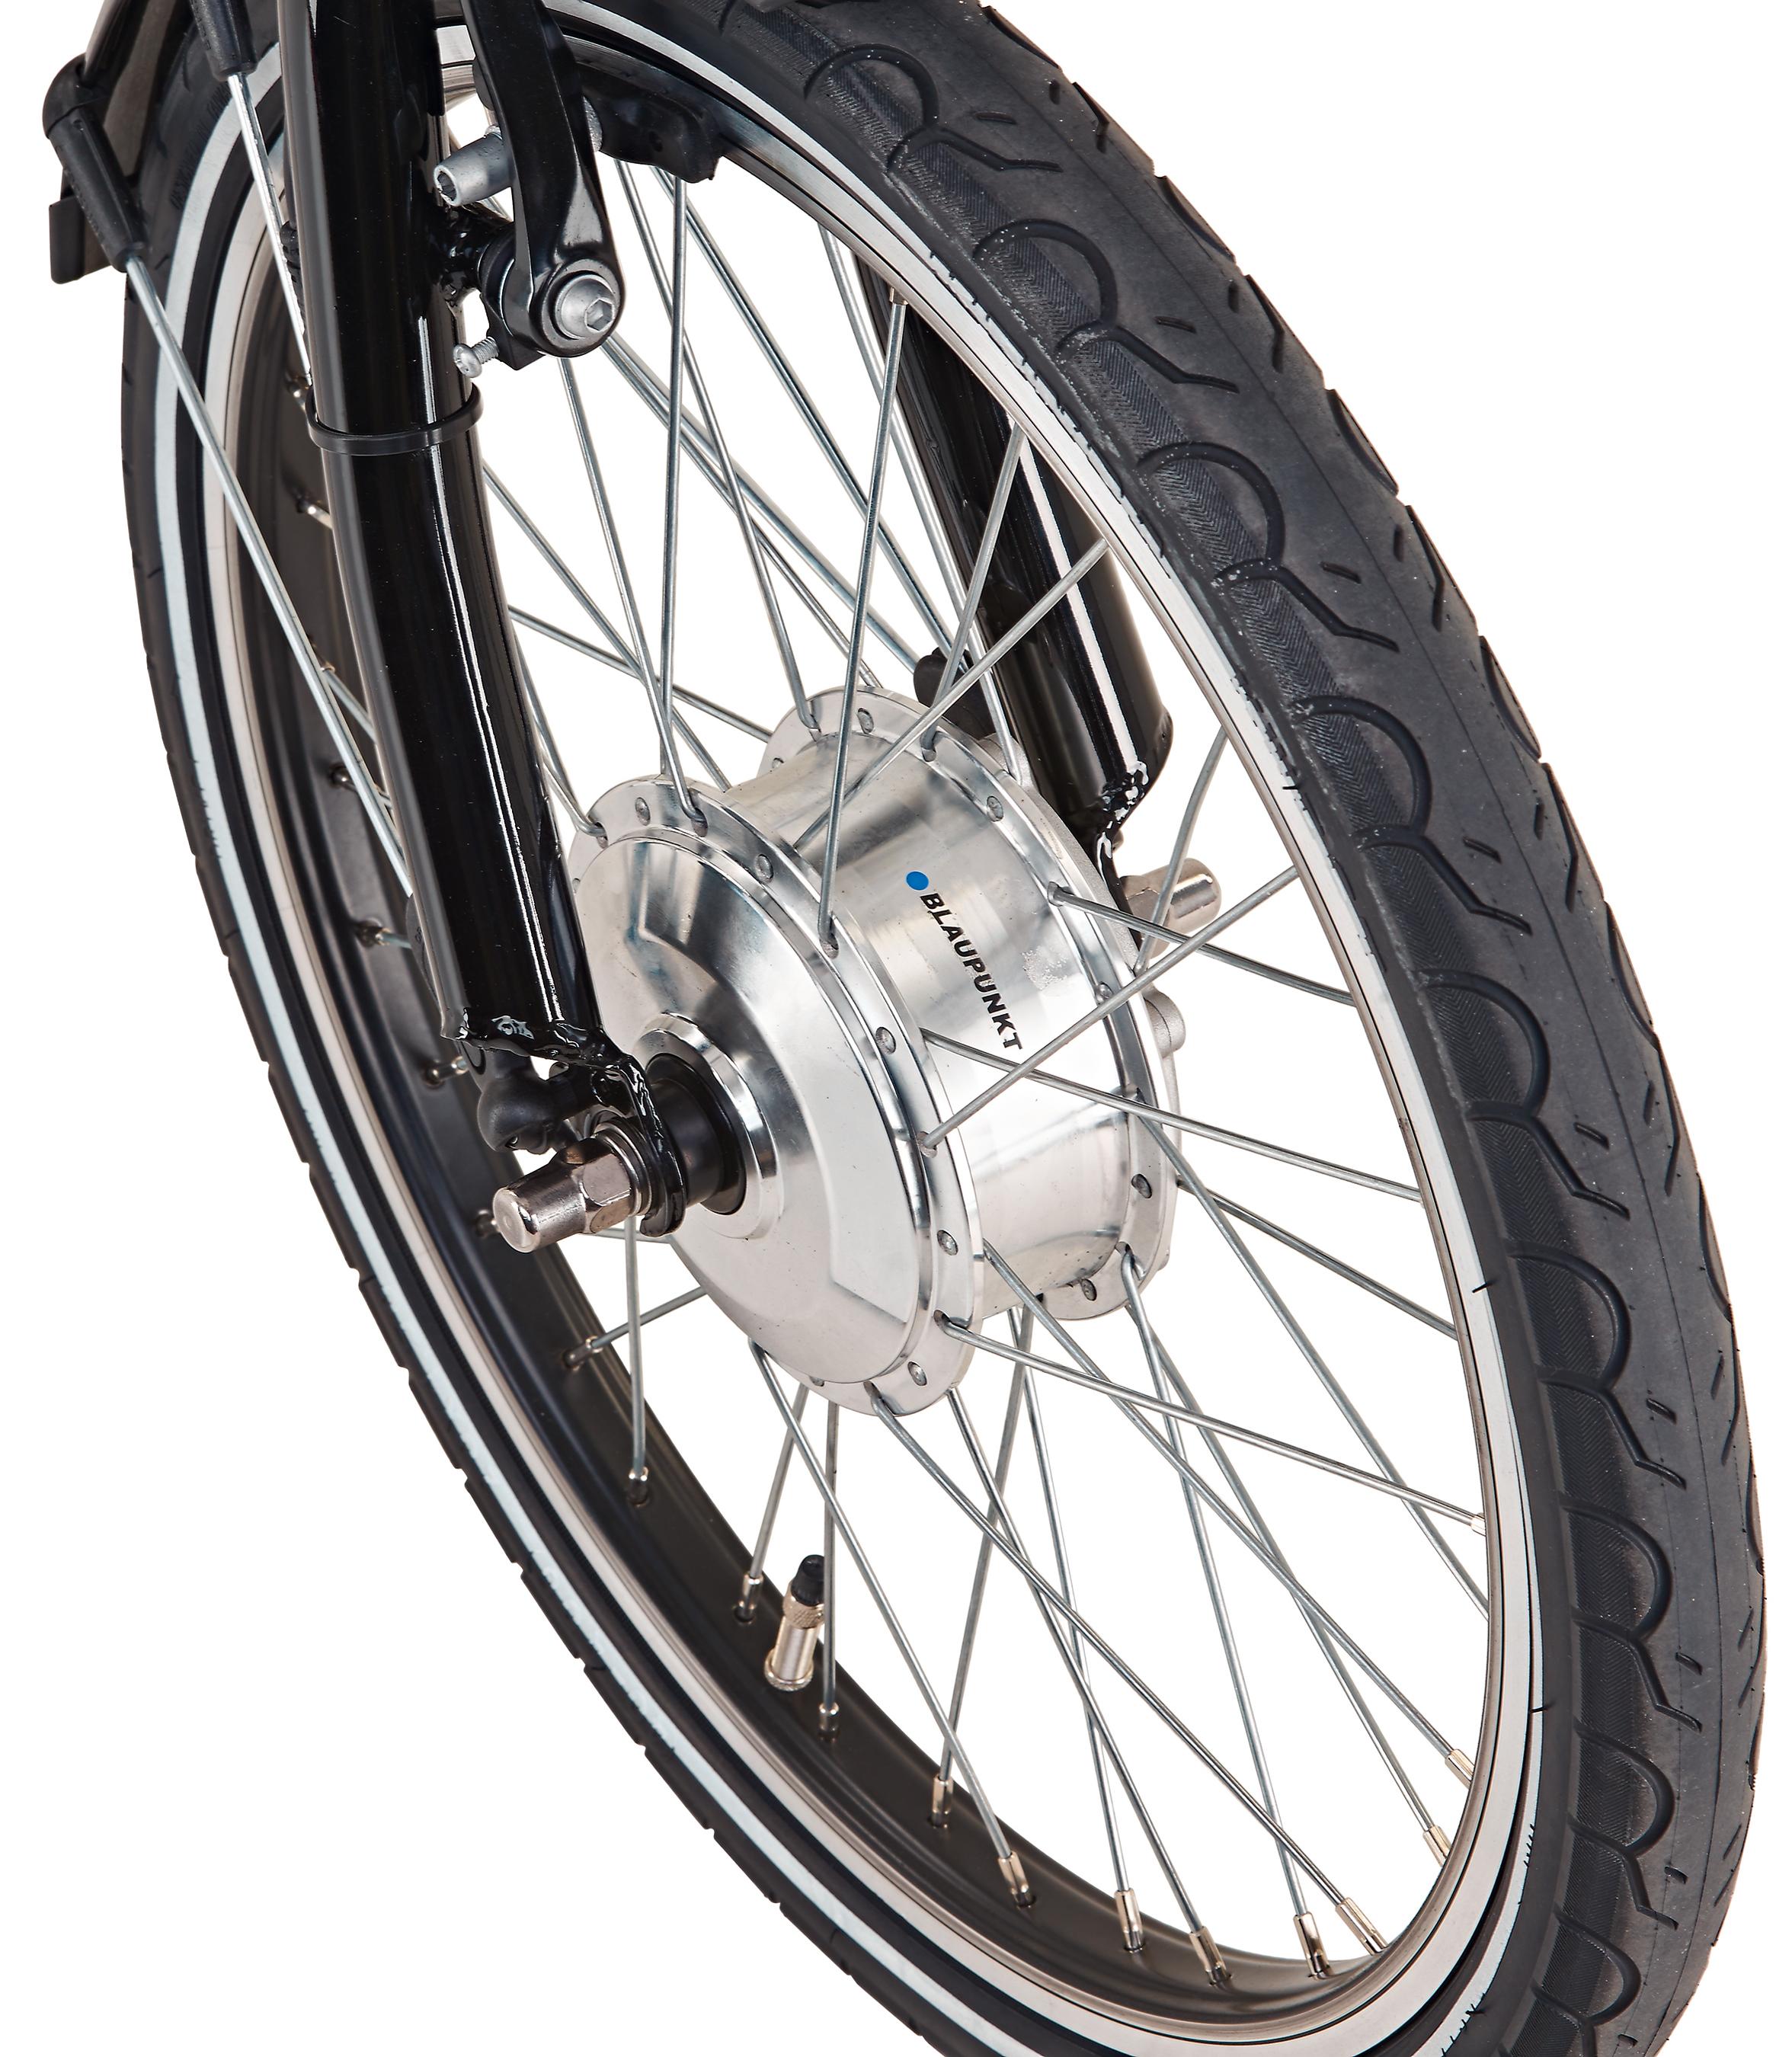 "Prophete Elektrofahrrad / E-Bike Geniesser e9.2 City E-Bike 20"" Bild 5"